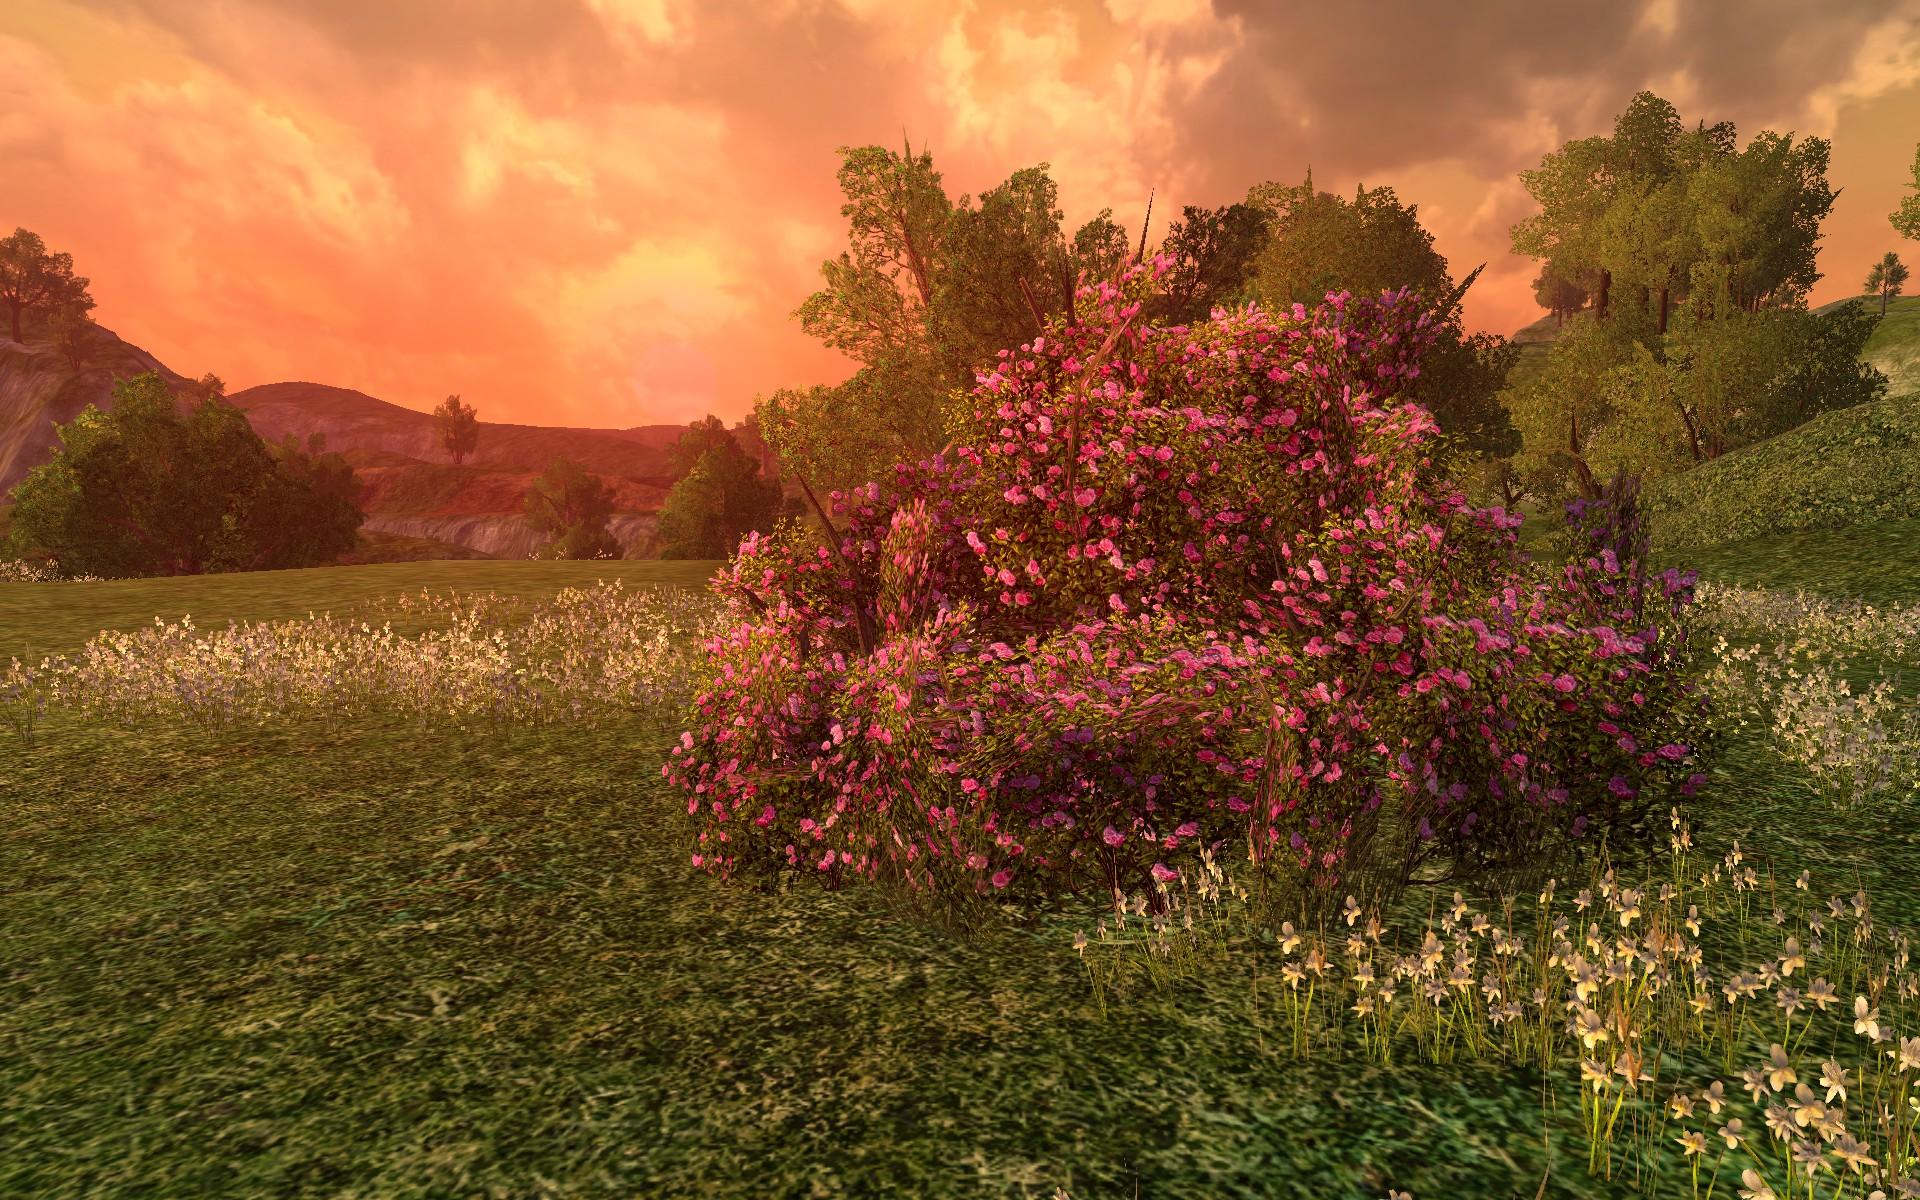 Grand Buisson De Roses Roses Dimloth Melui Dco Du Milieu